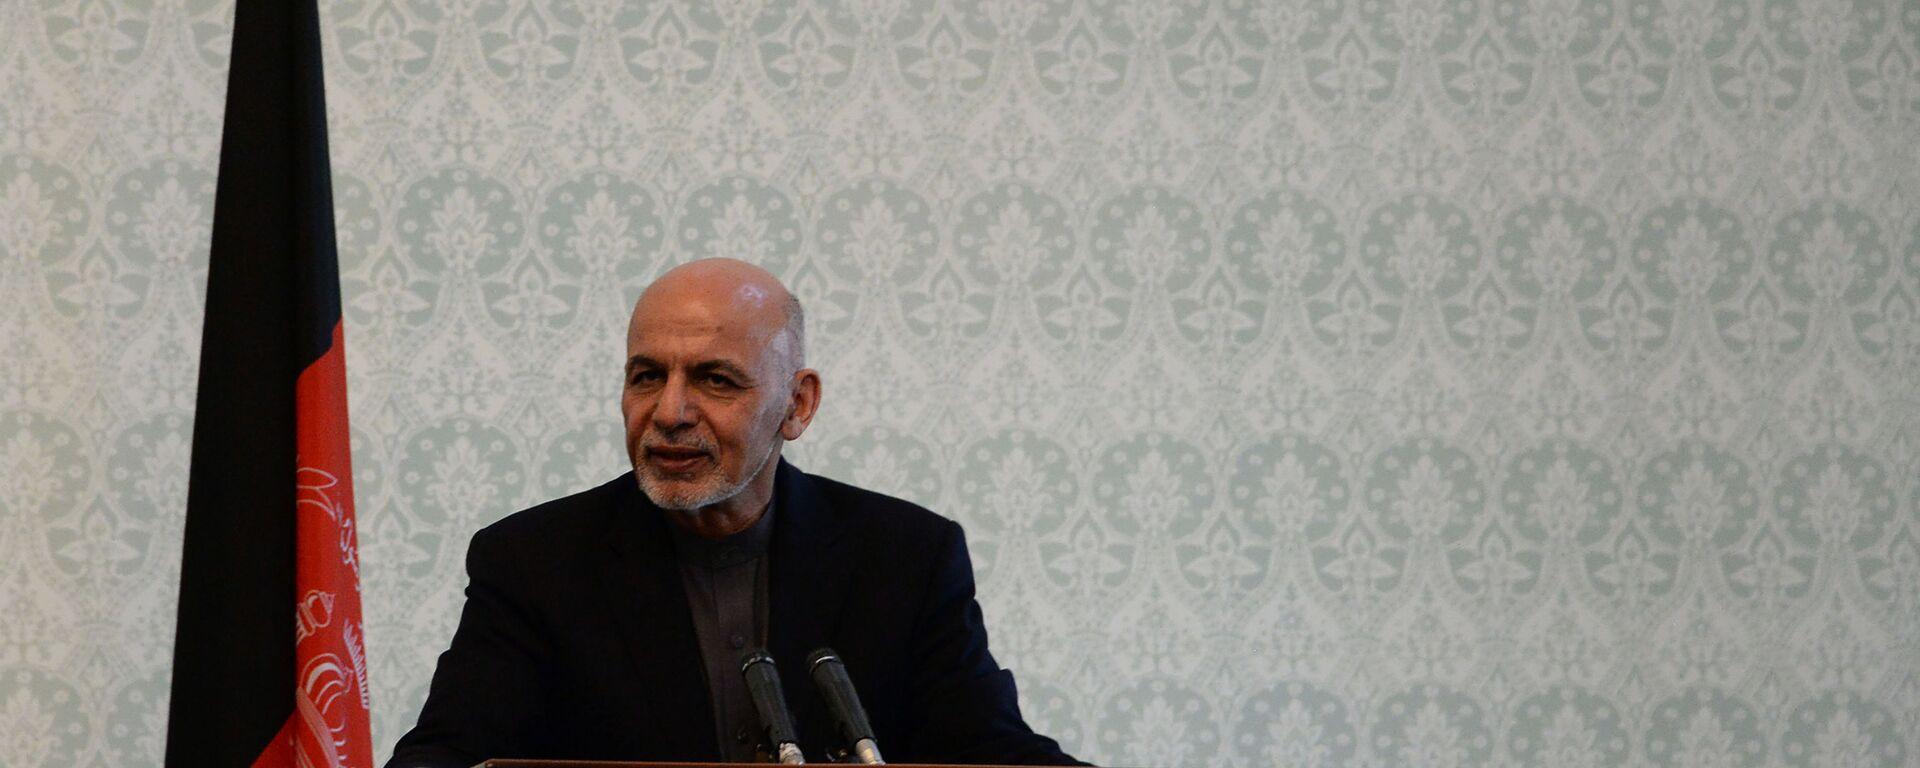 Presidente dell'Afghanistan Ashraf Ghani - Sputnik Italia, 1920, 18.08.2021